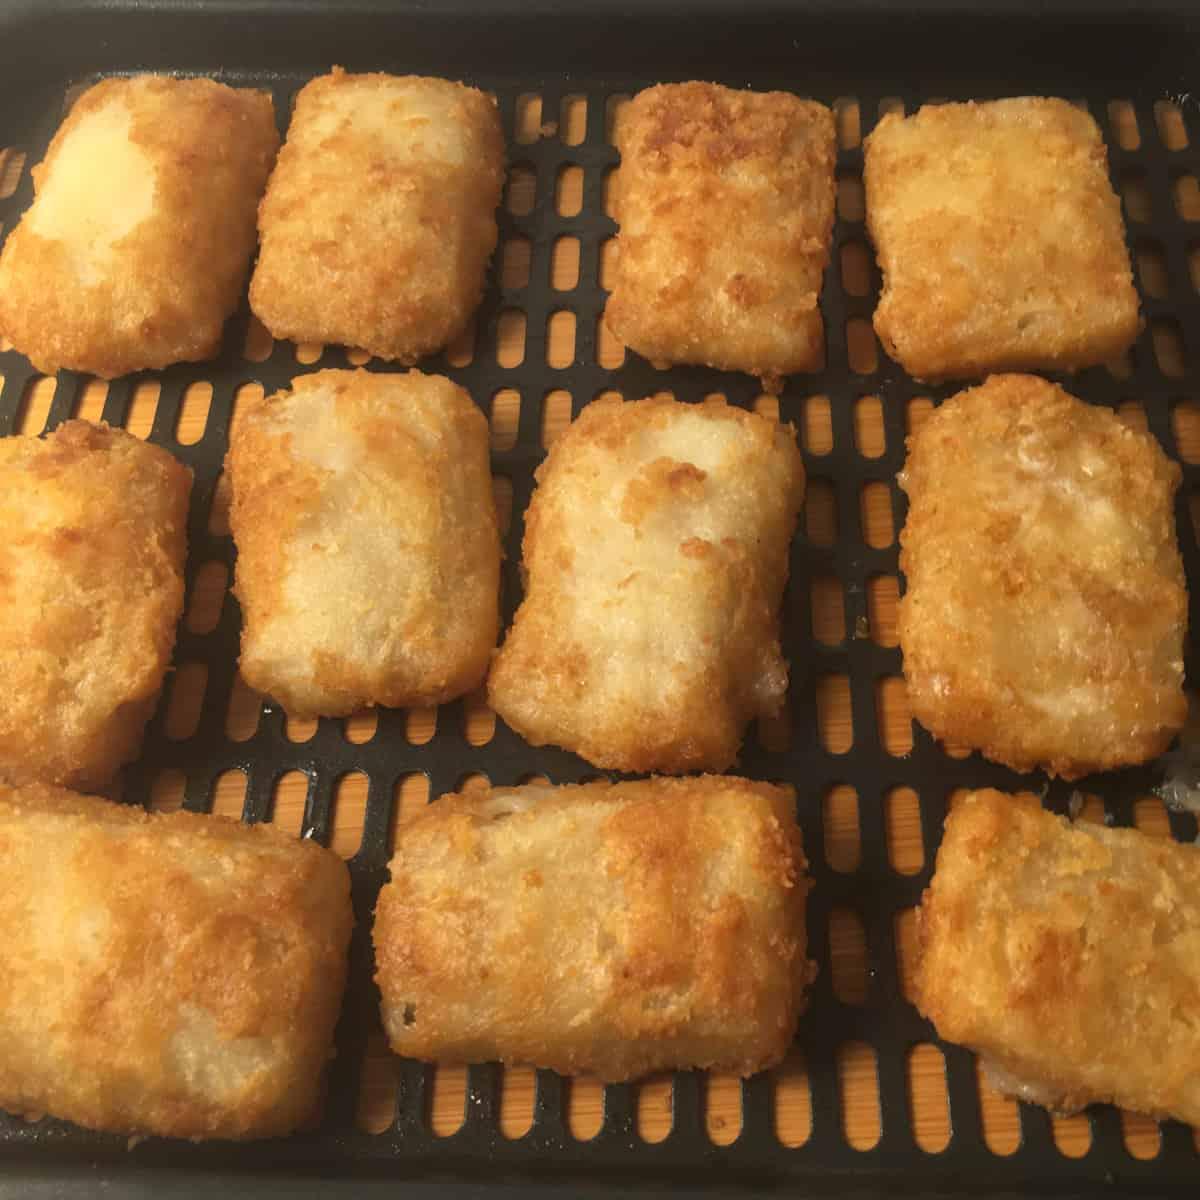 trader joes fish nuggets air fryer